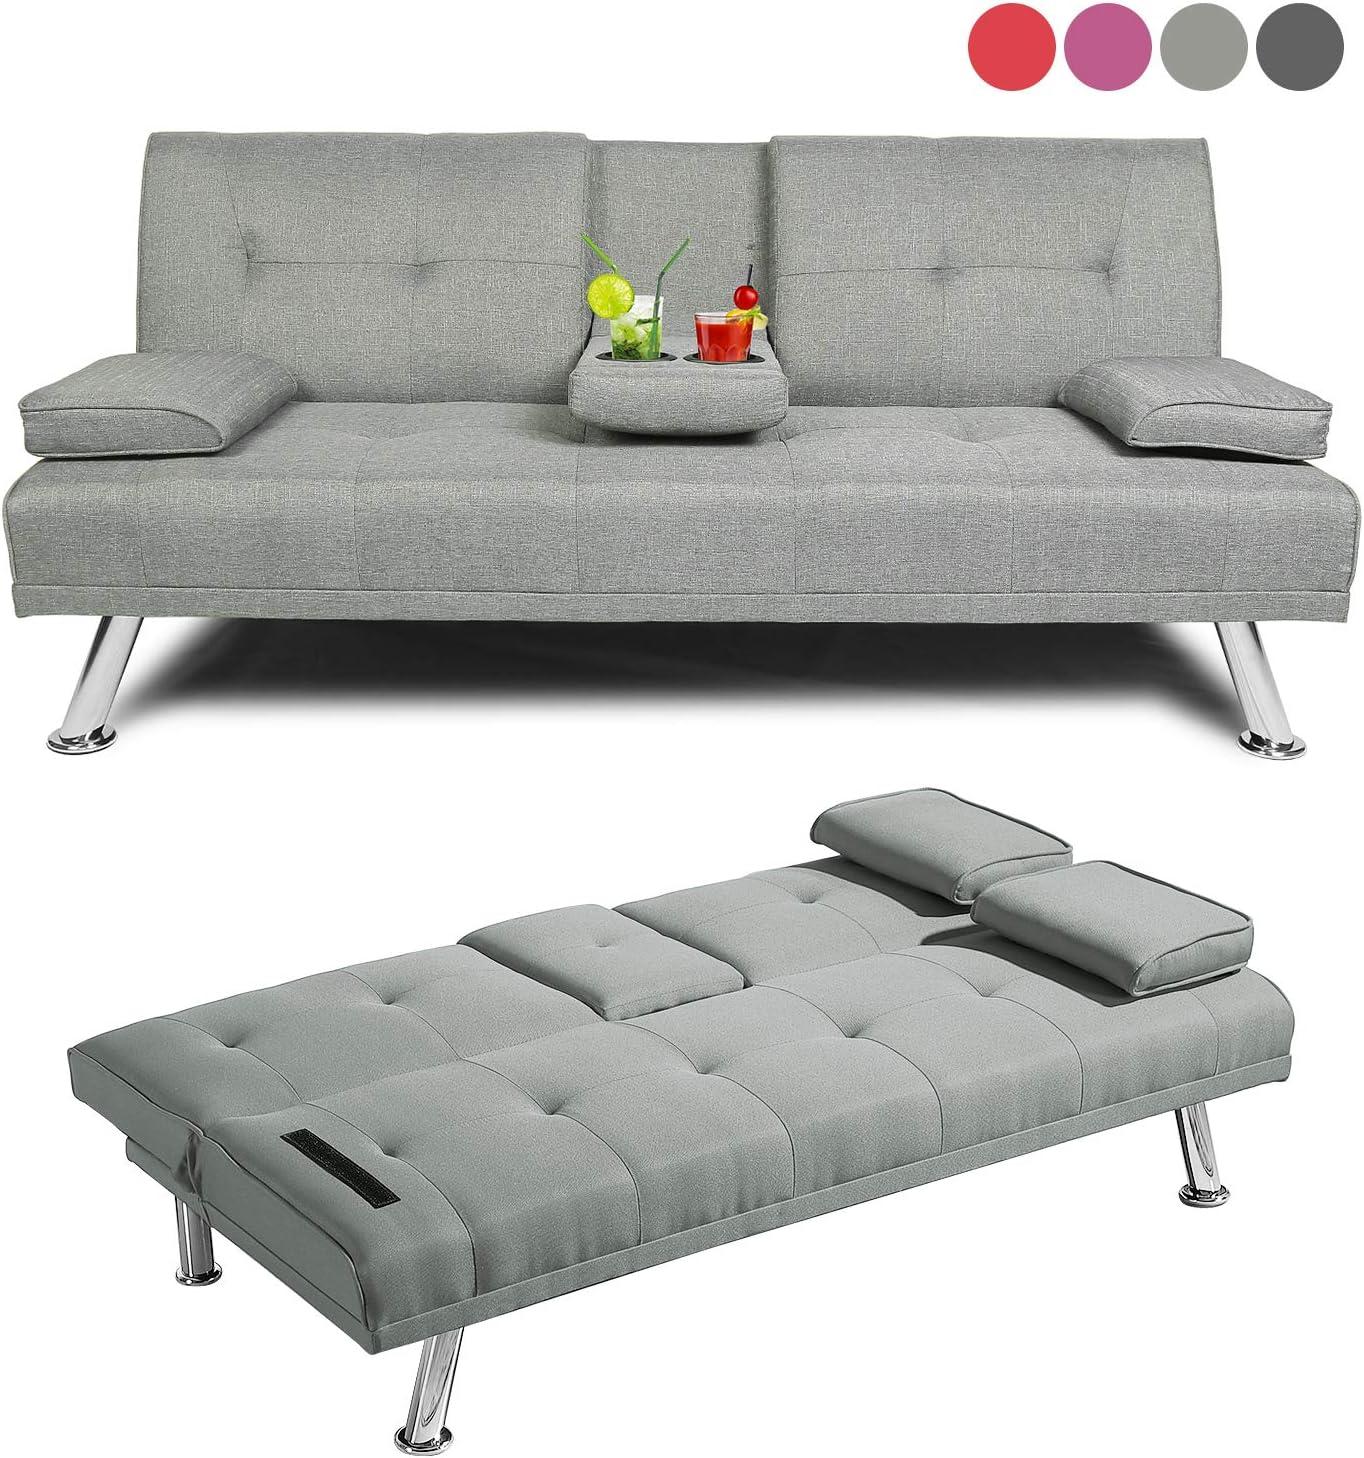 - Amazon.com: Baysitone Futon Sofa Bed Twin Size Sleeper